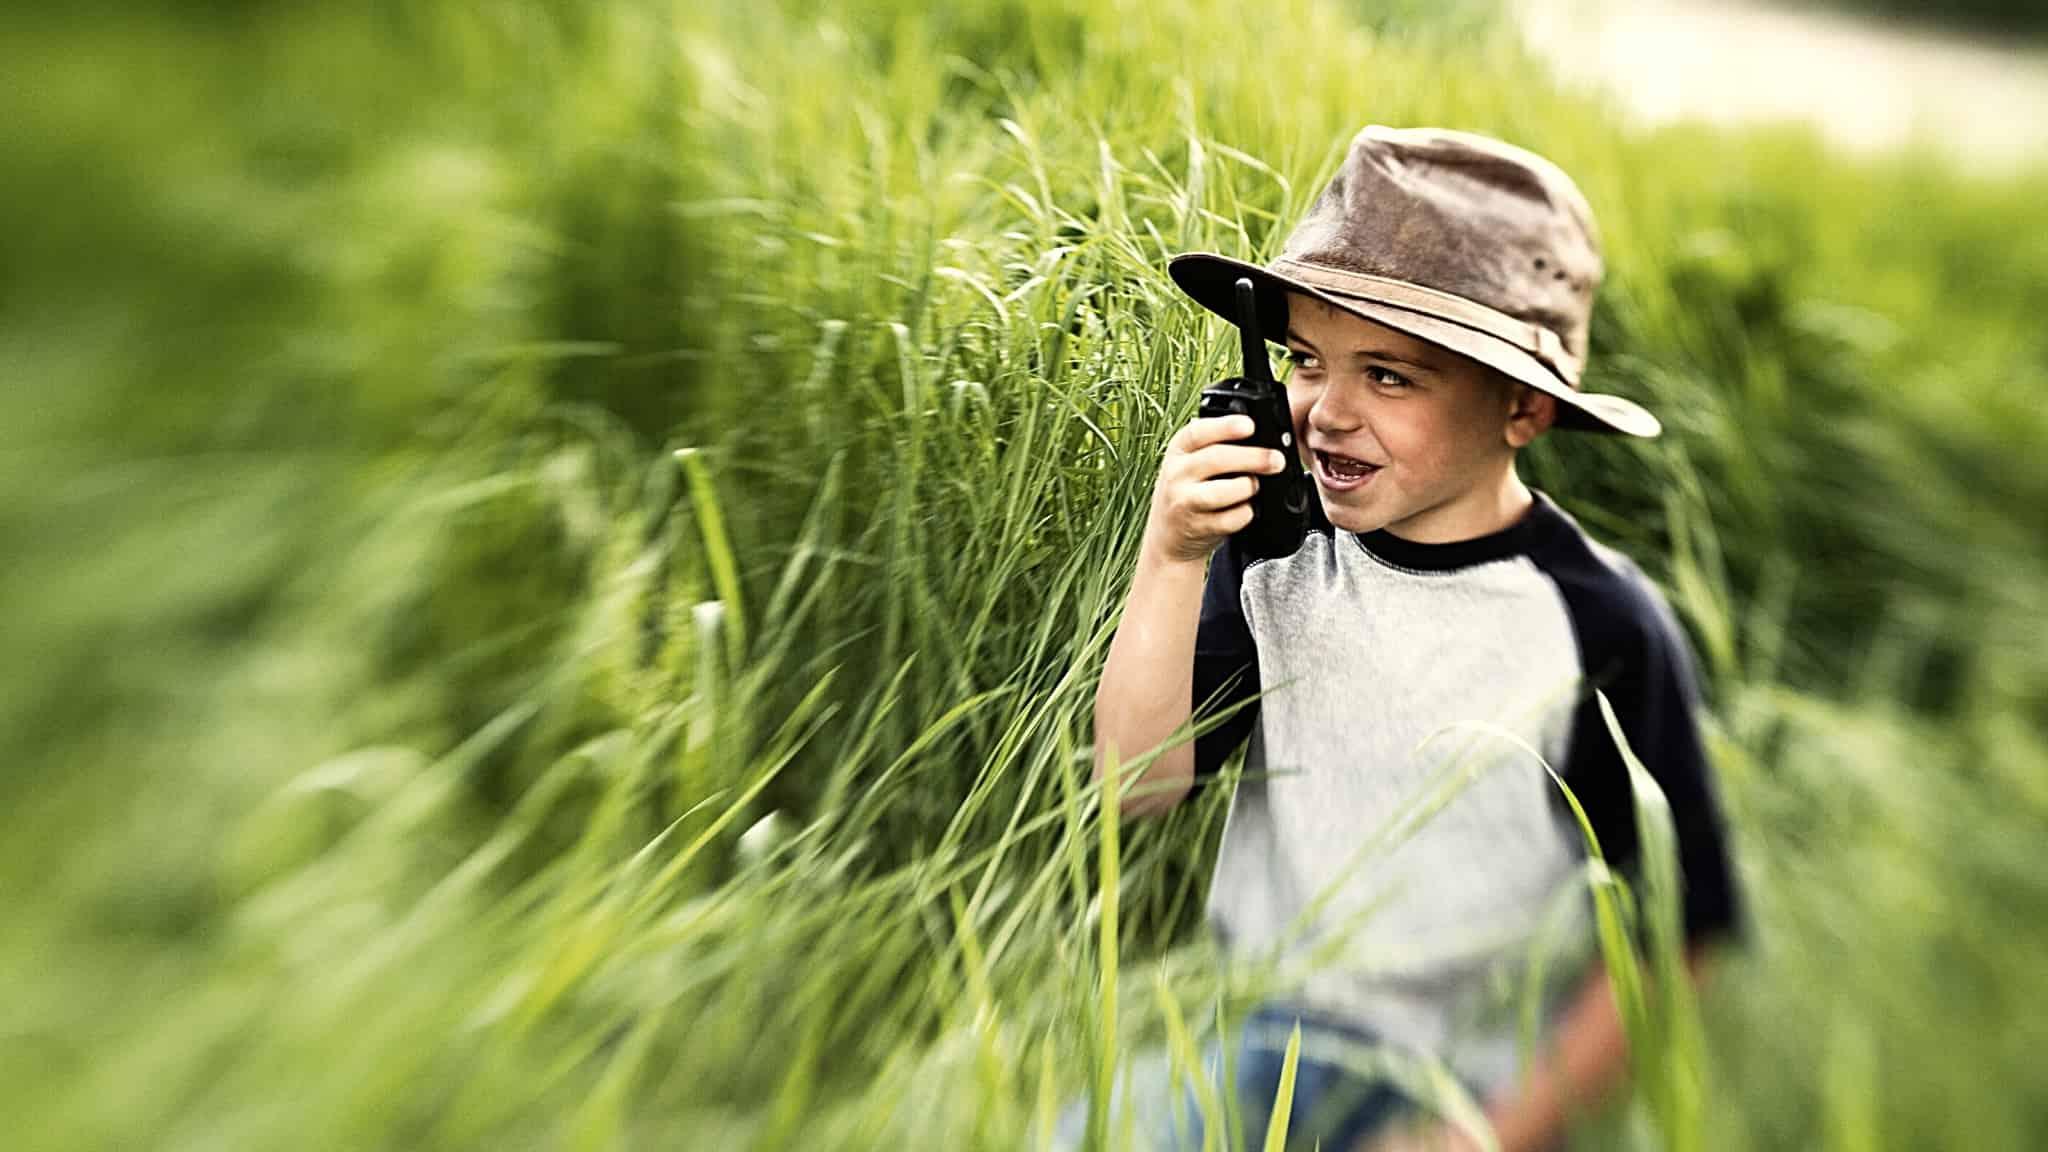 Leuke spelletjes met een walkie talkie